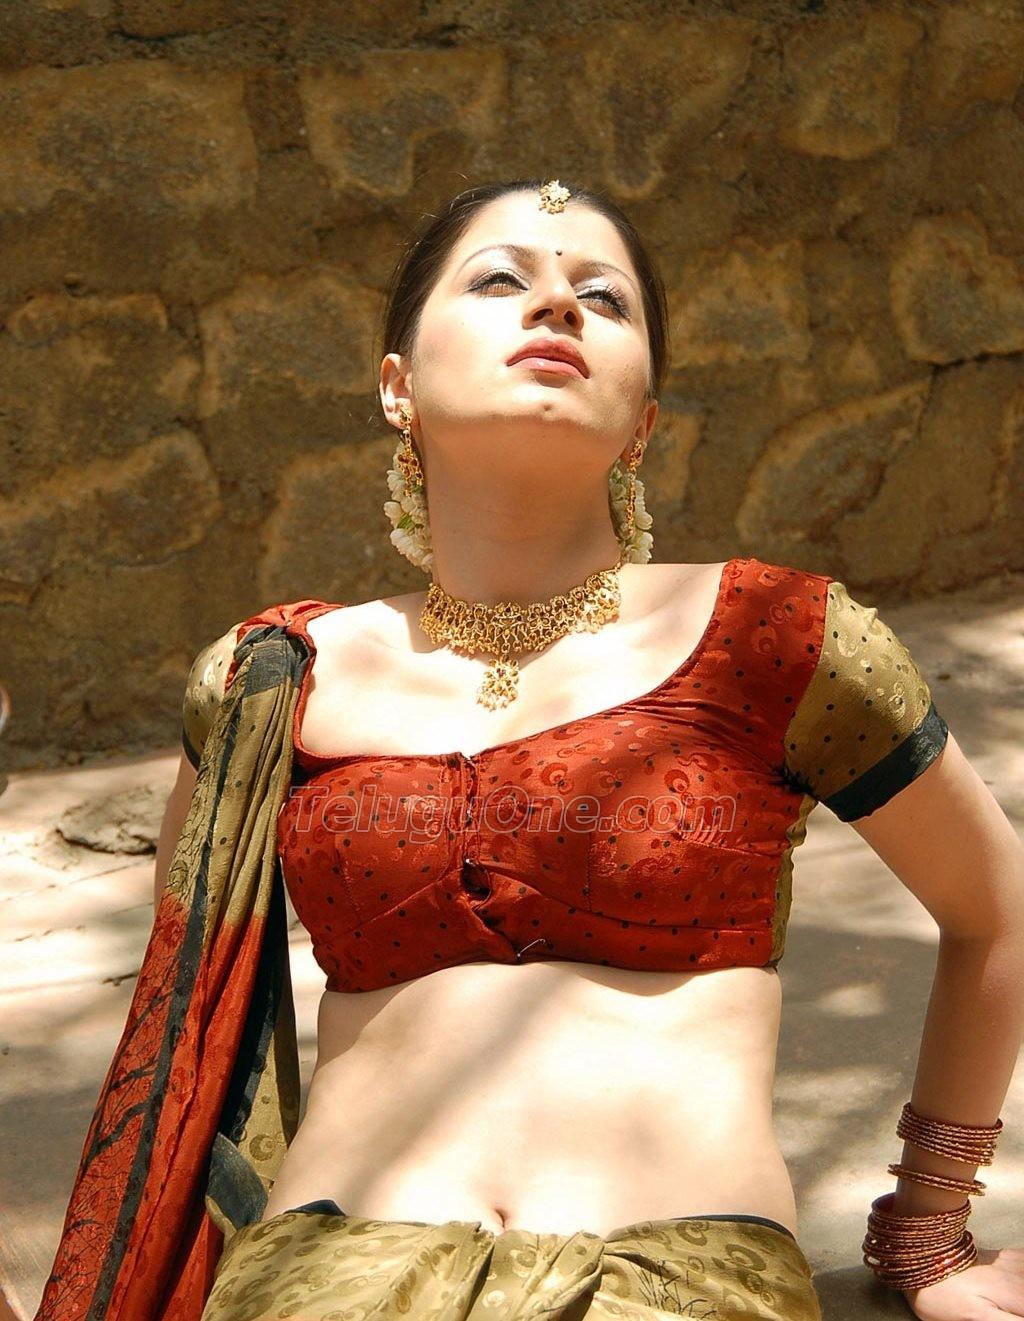 ... Hot Navel In Transparent Saree At Bodyguard Movie Photo 566x800